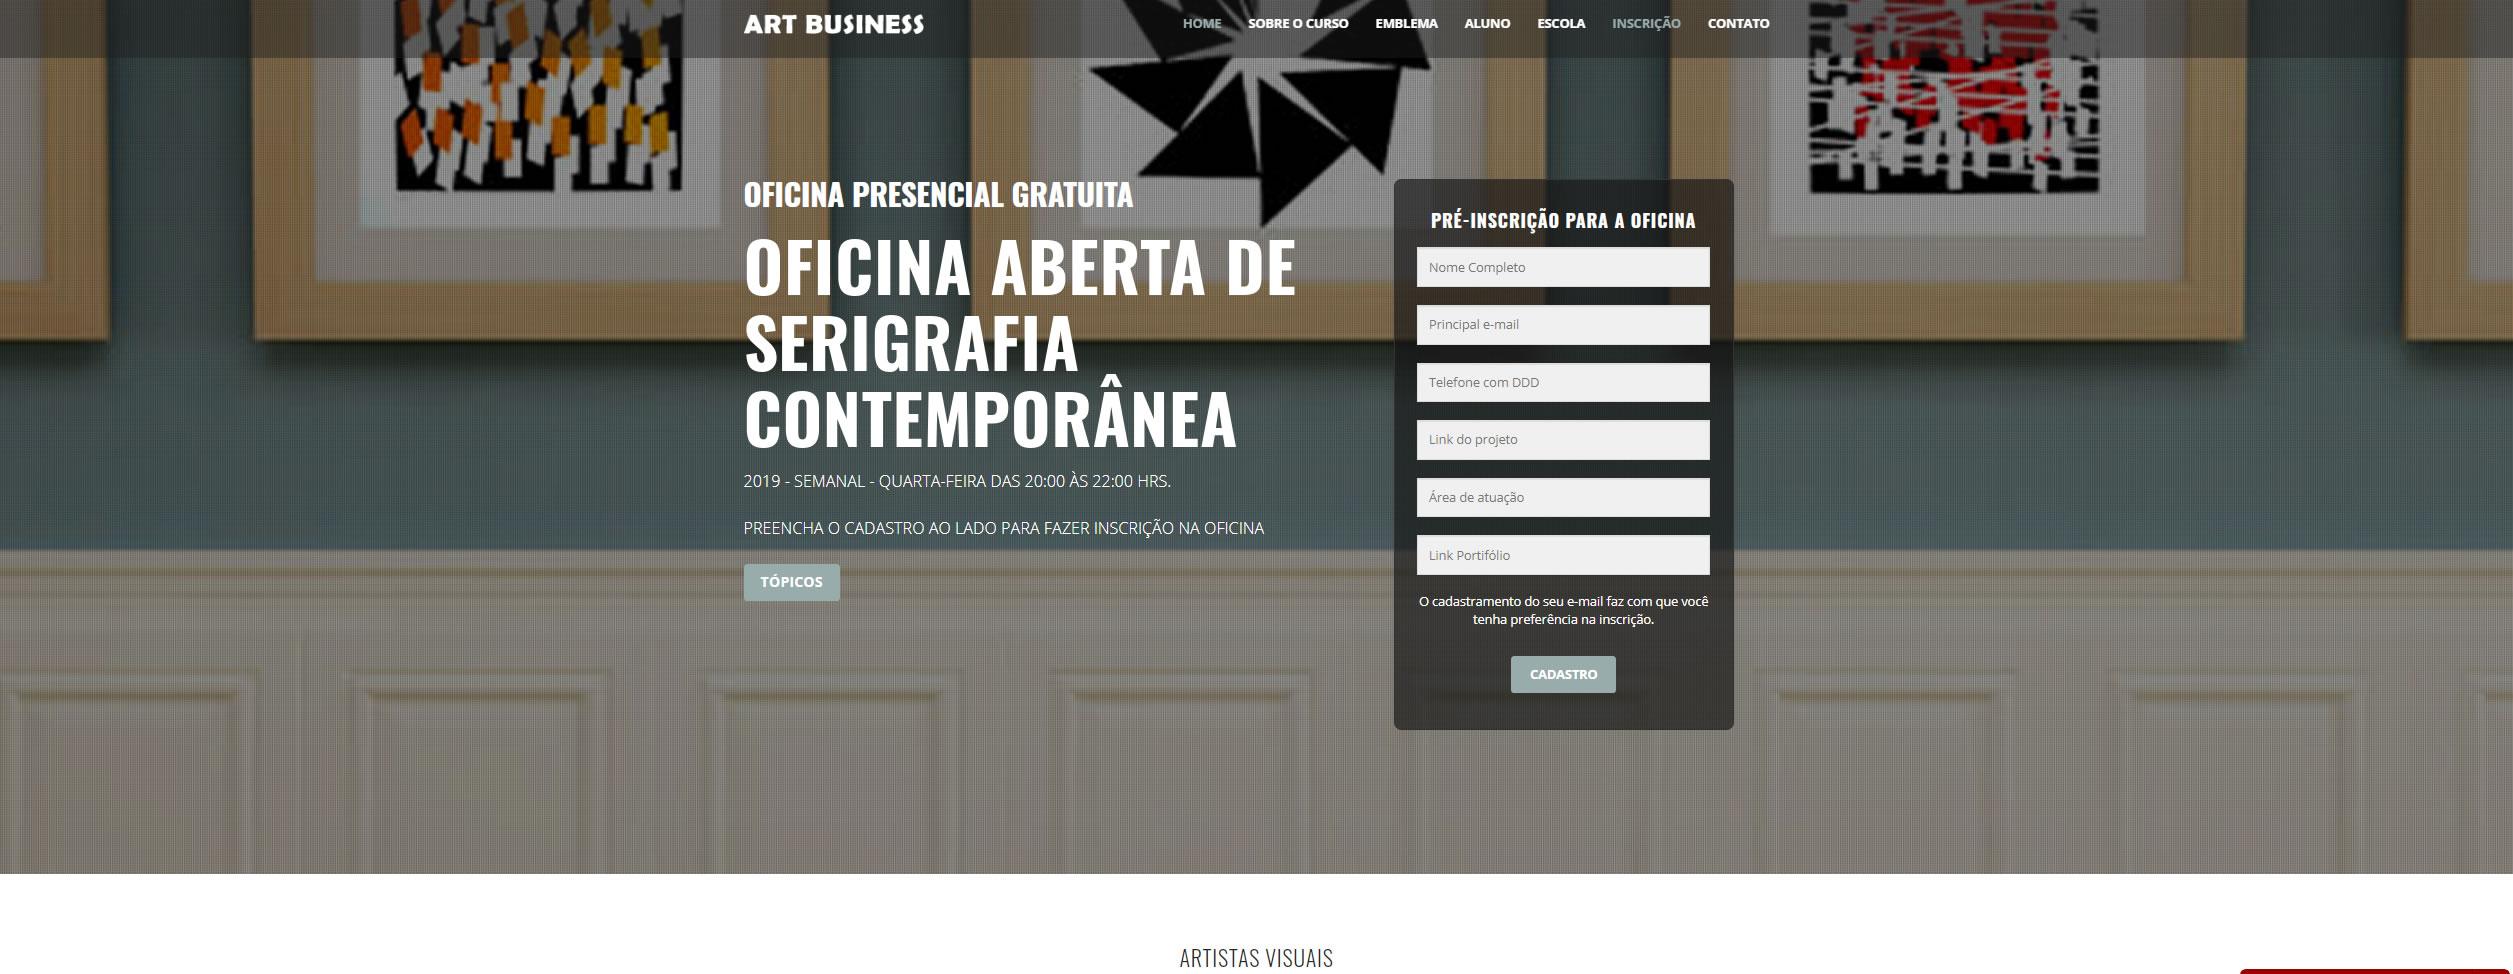 oficina_gratuita_serigrafia_galeria_de_gravura